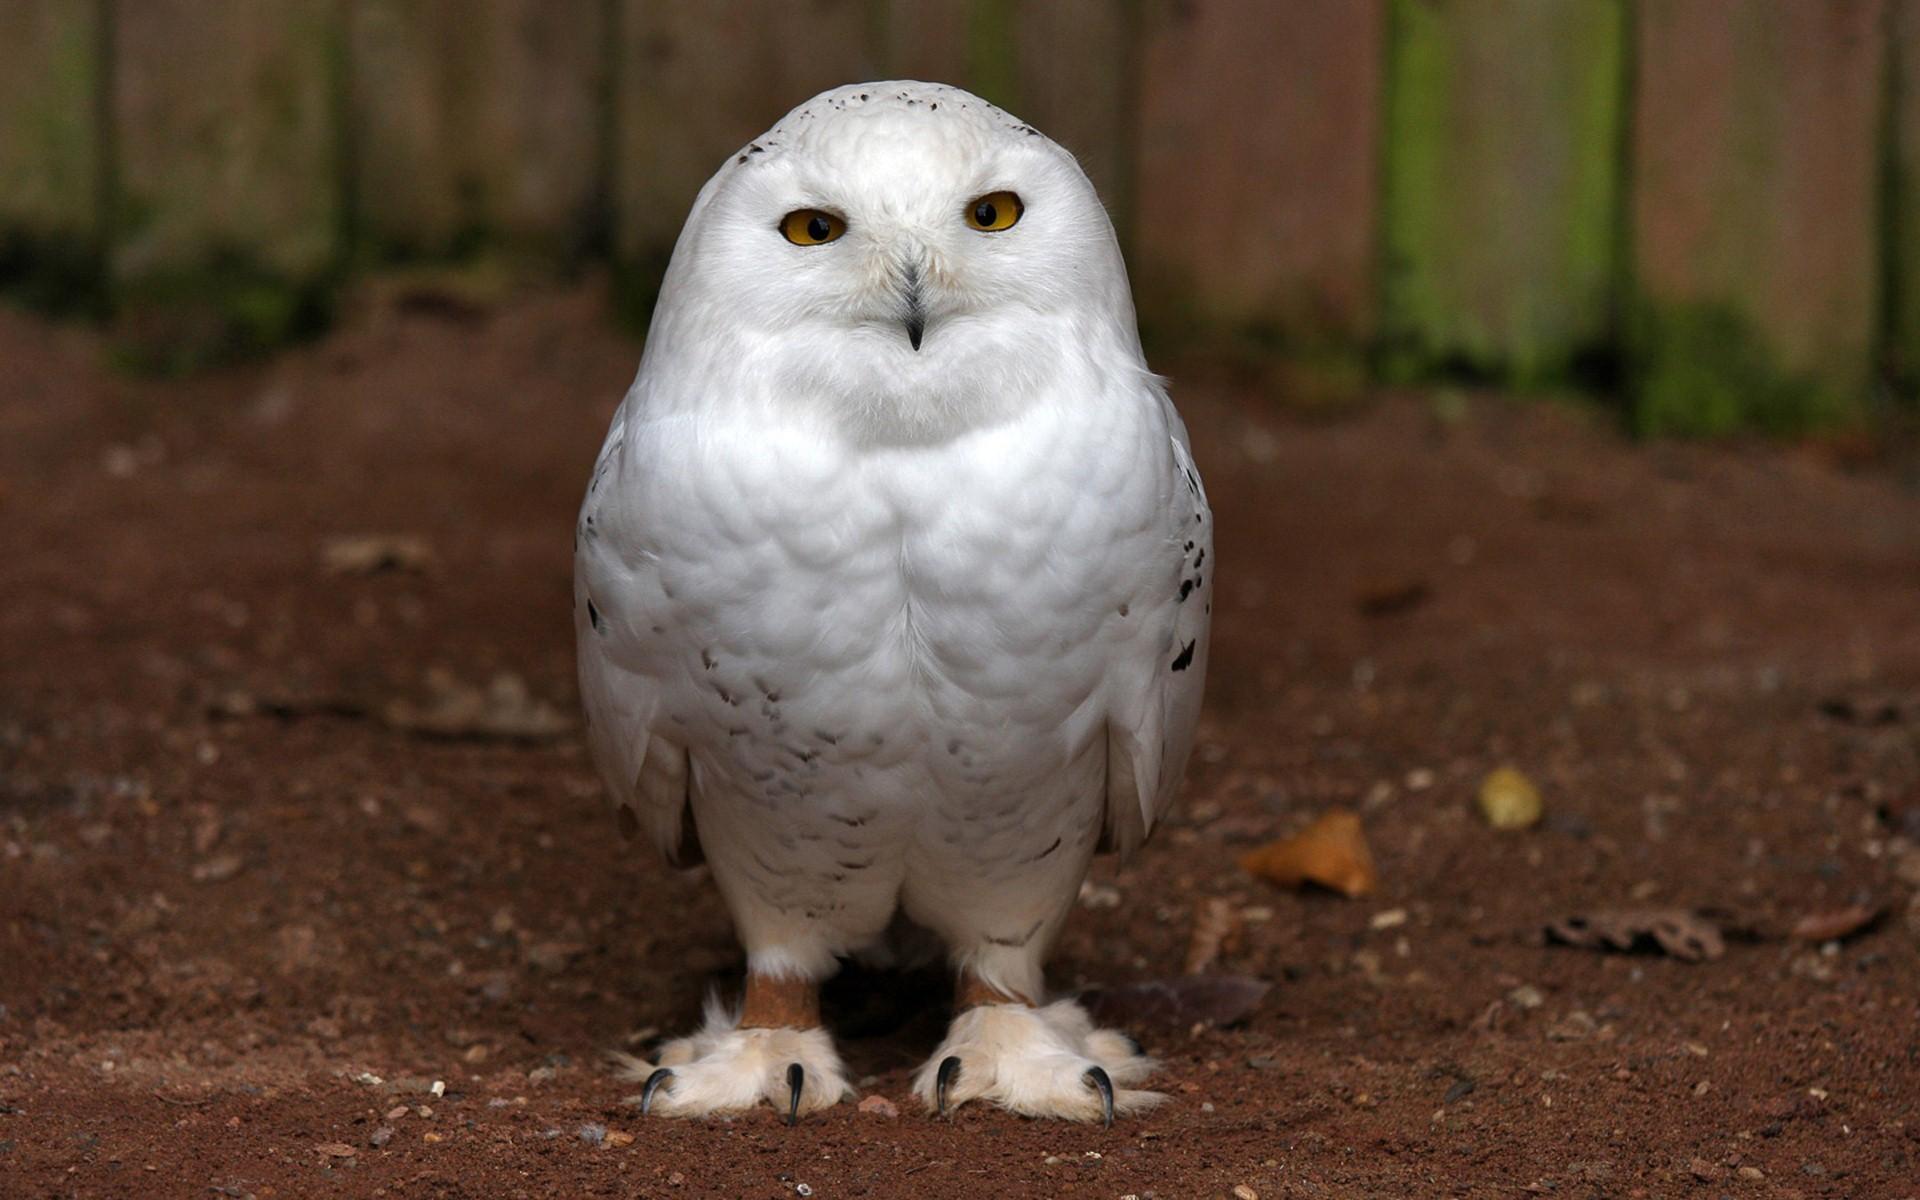 Cute white owl wallpaper full HD